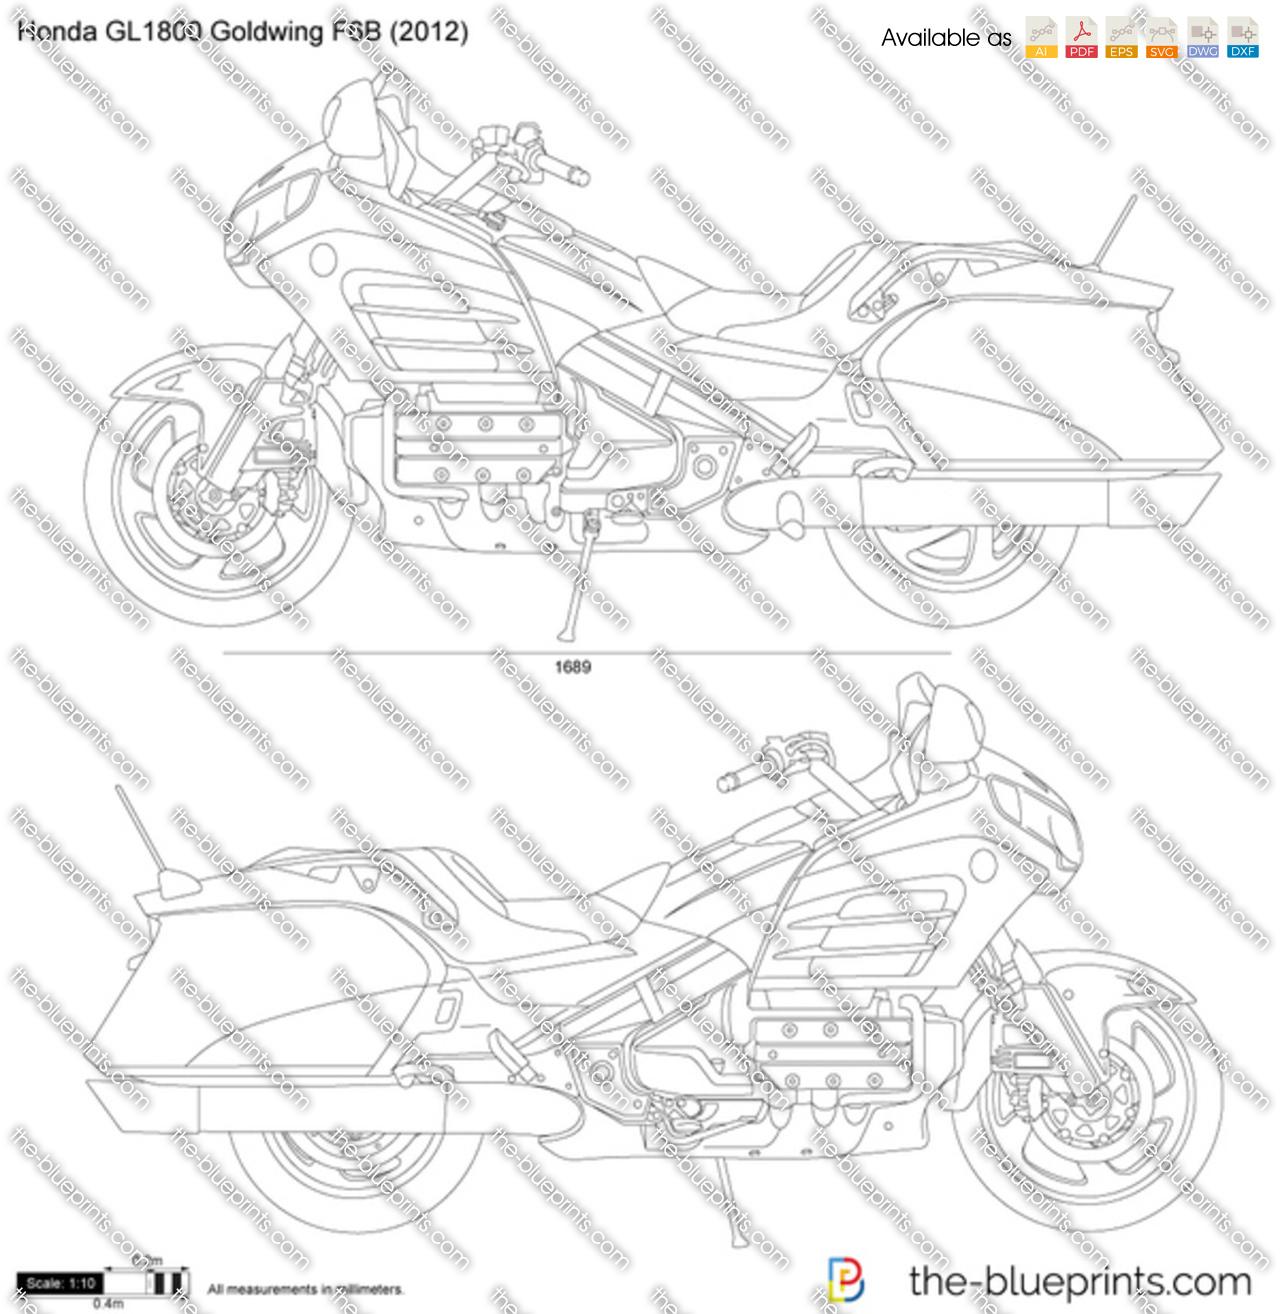 Honda GL1800 Goldwing F6B vector drawing